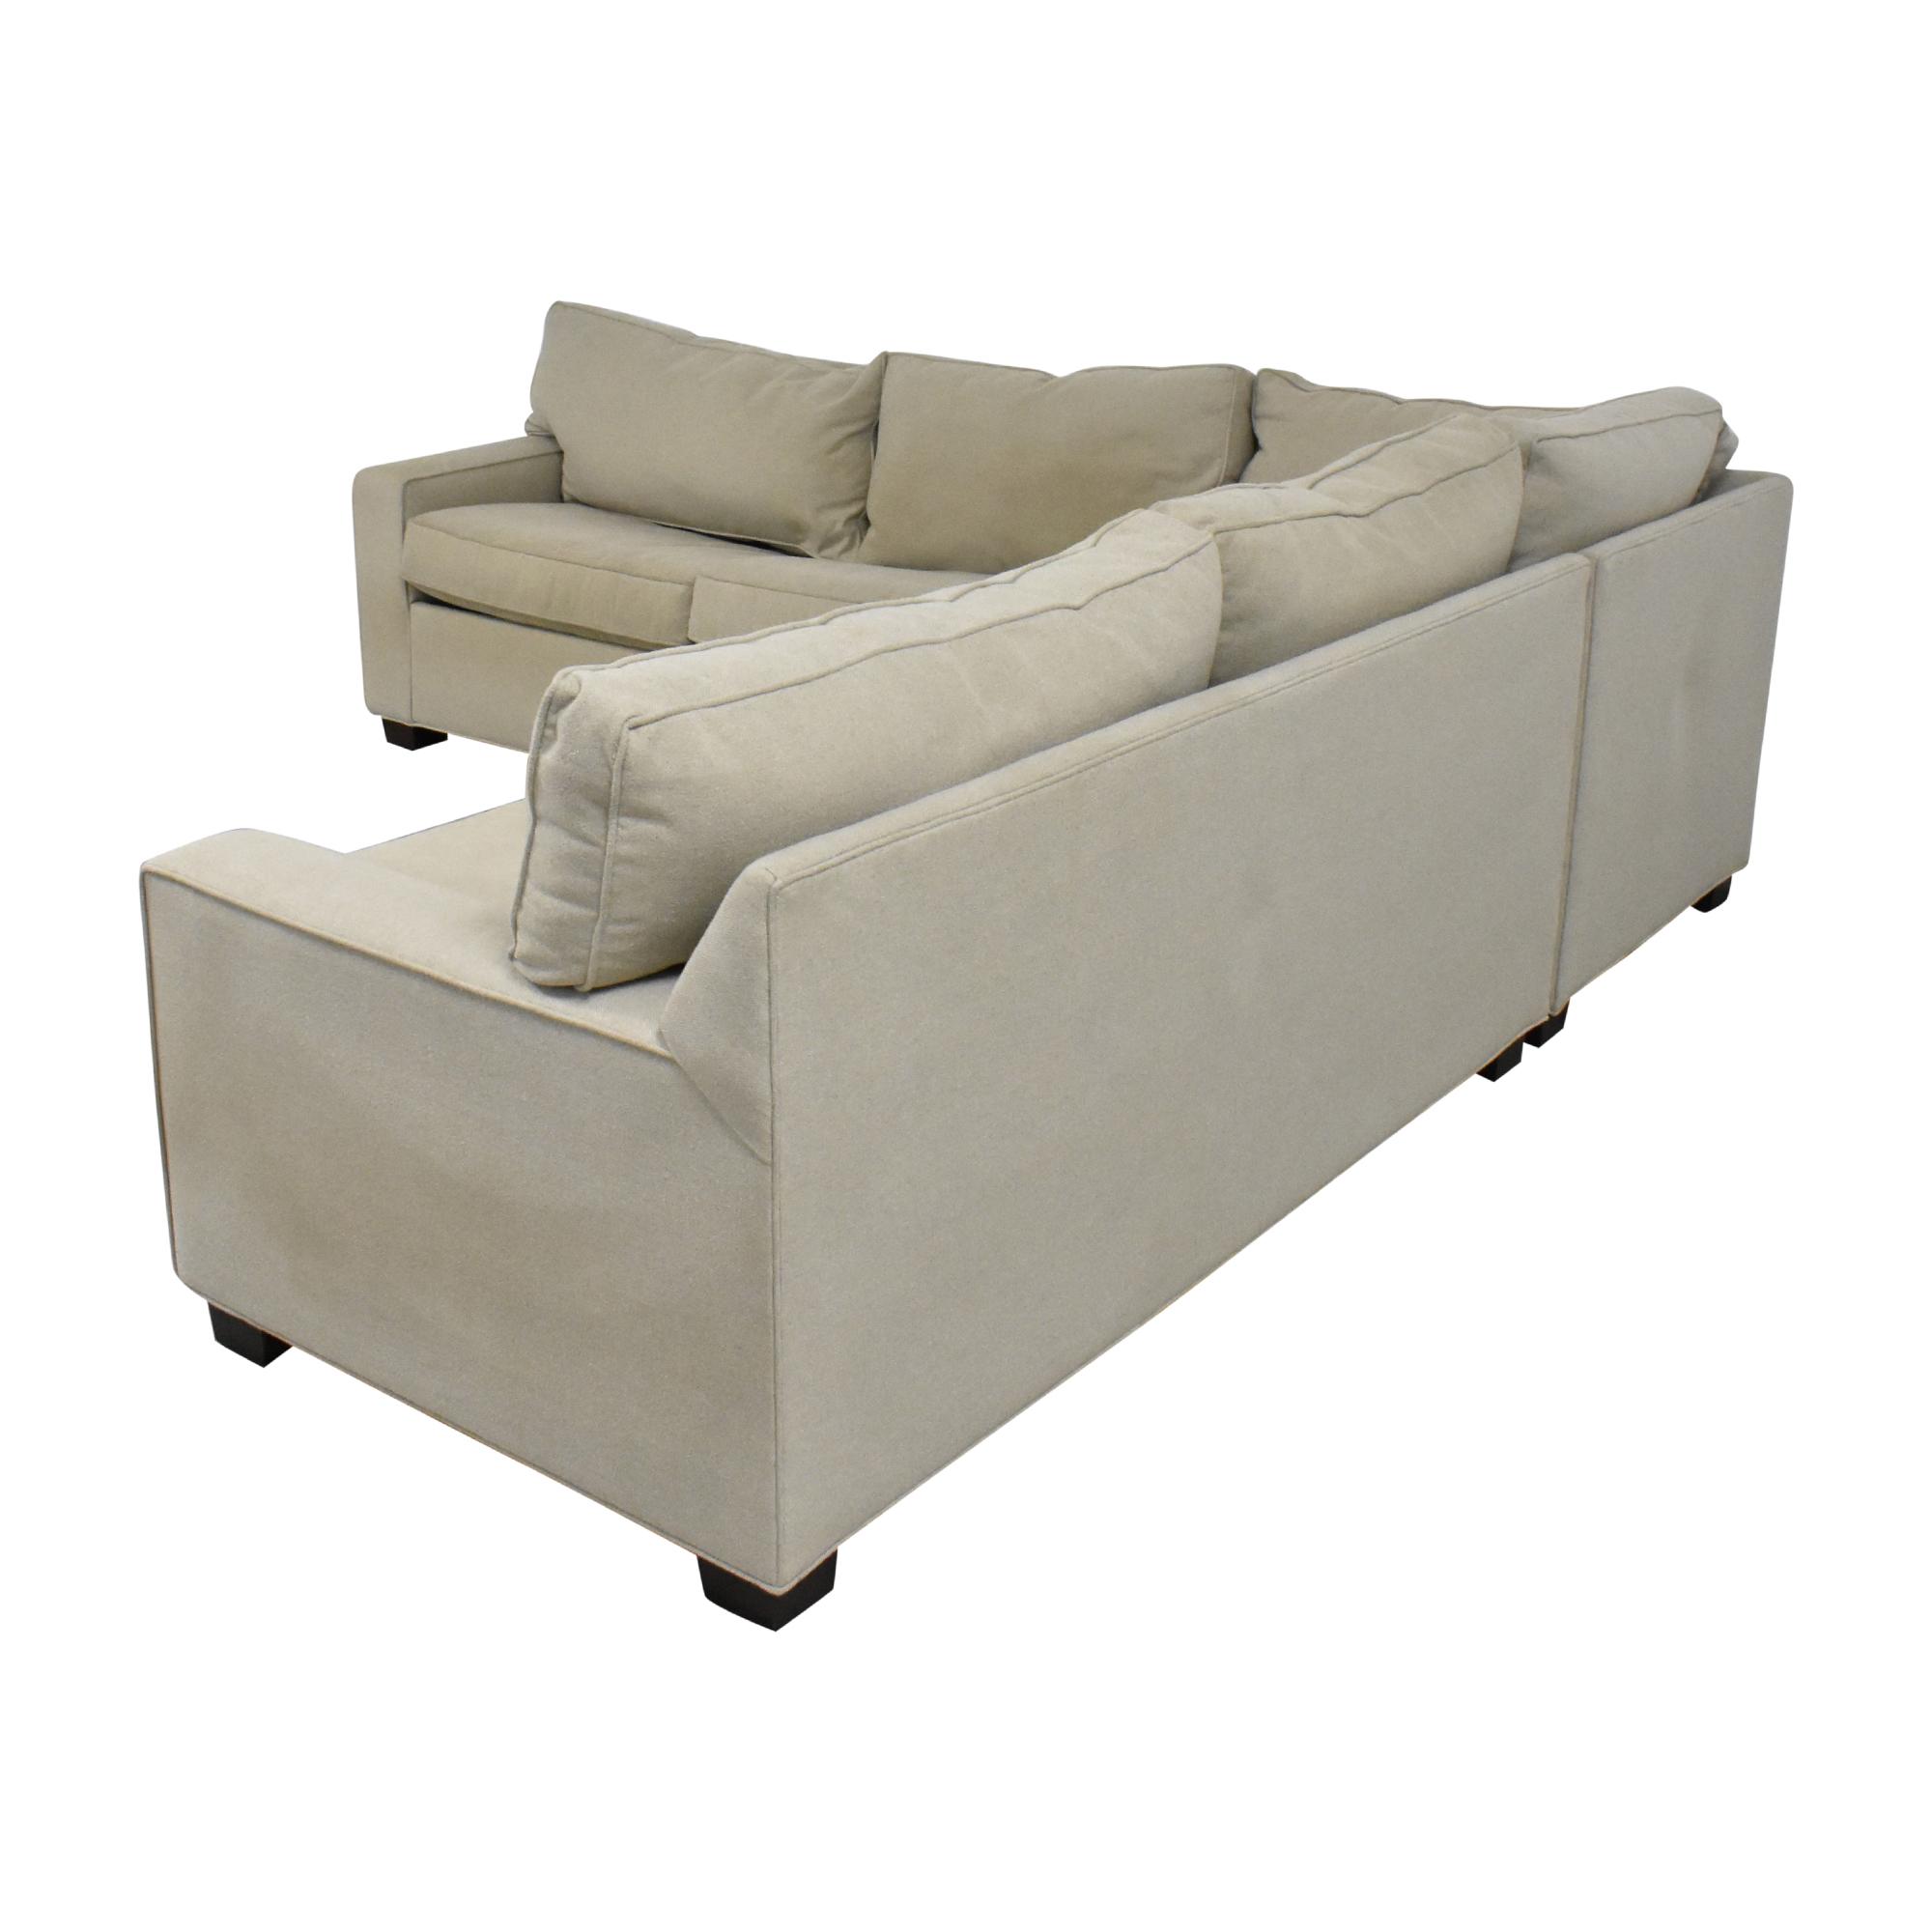 buy Mitchell Gold + Bob Williams Mitchell Gold + Bob Williams Sectional Sleeper Sofa online